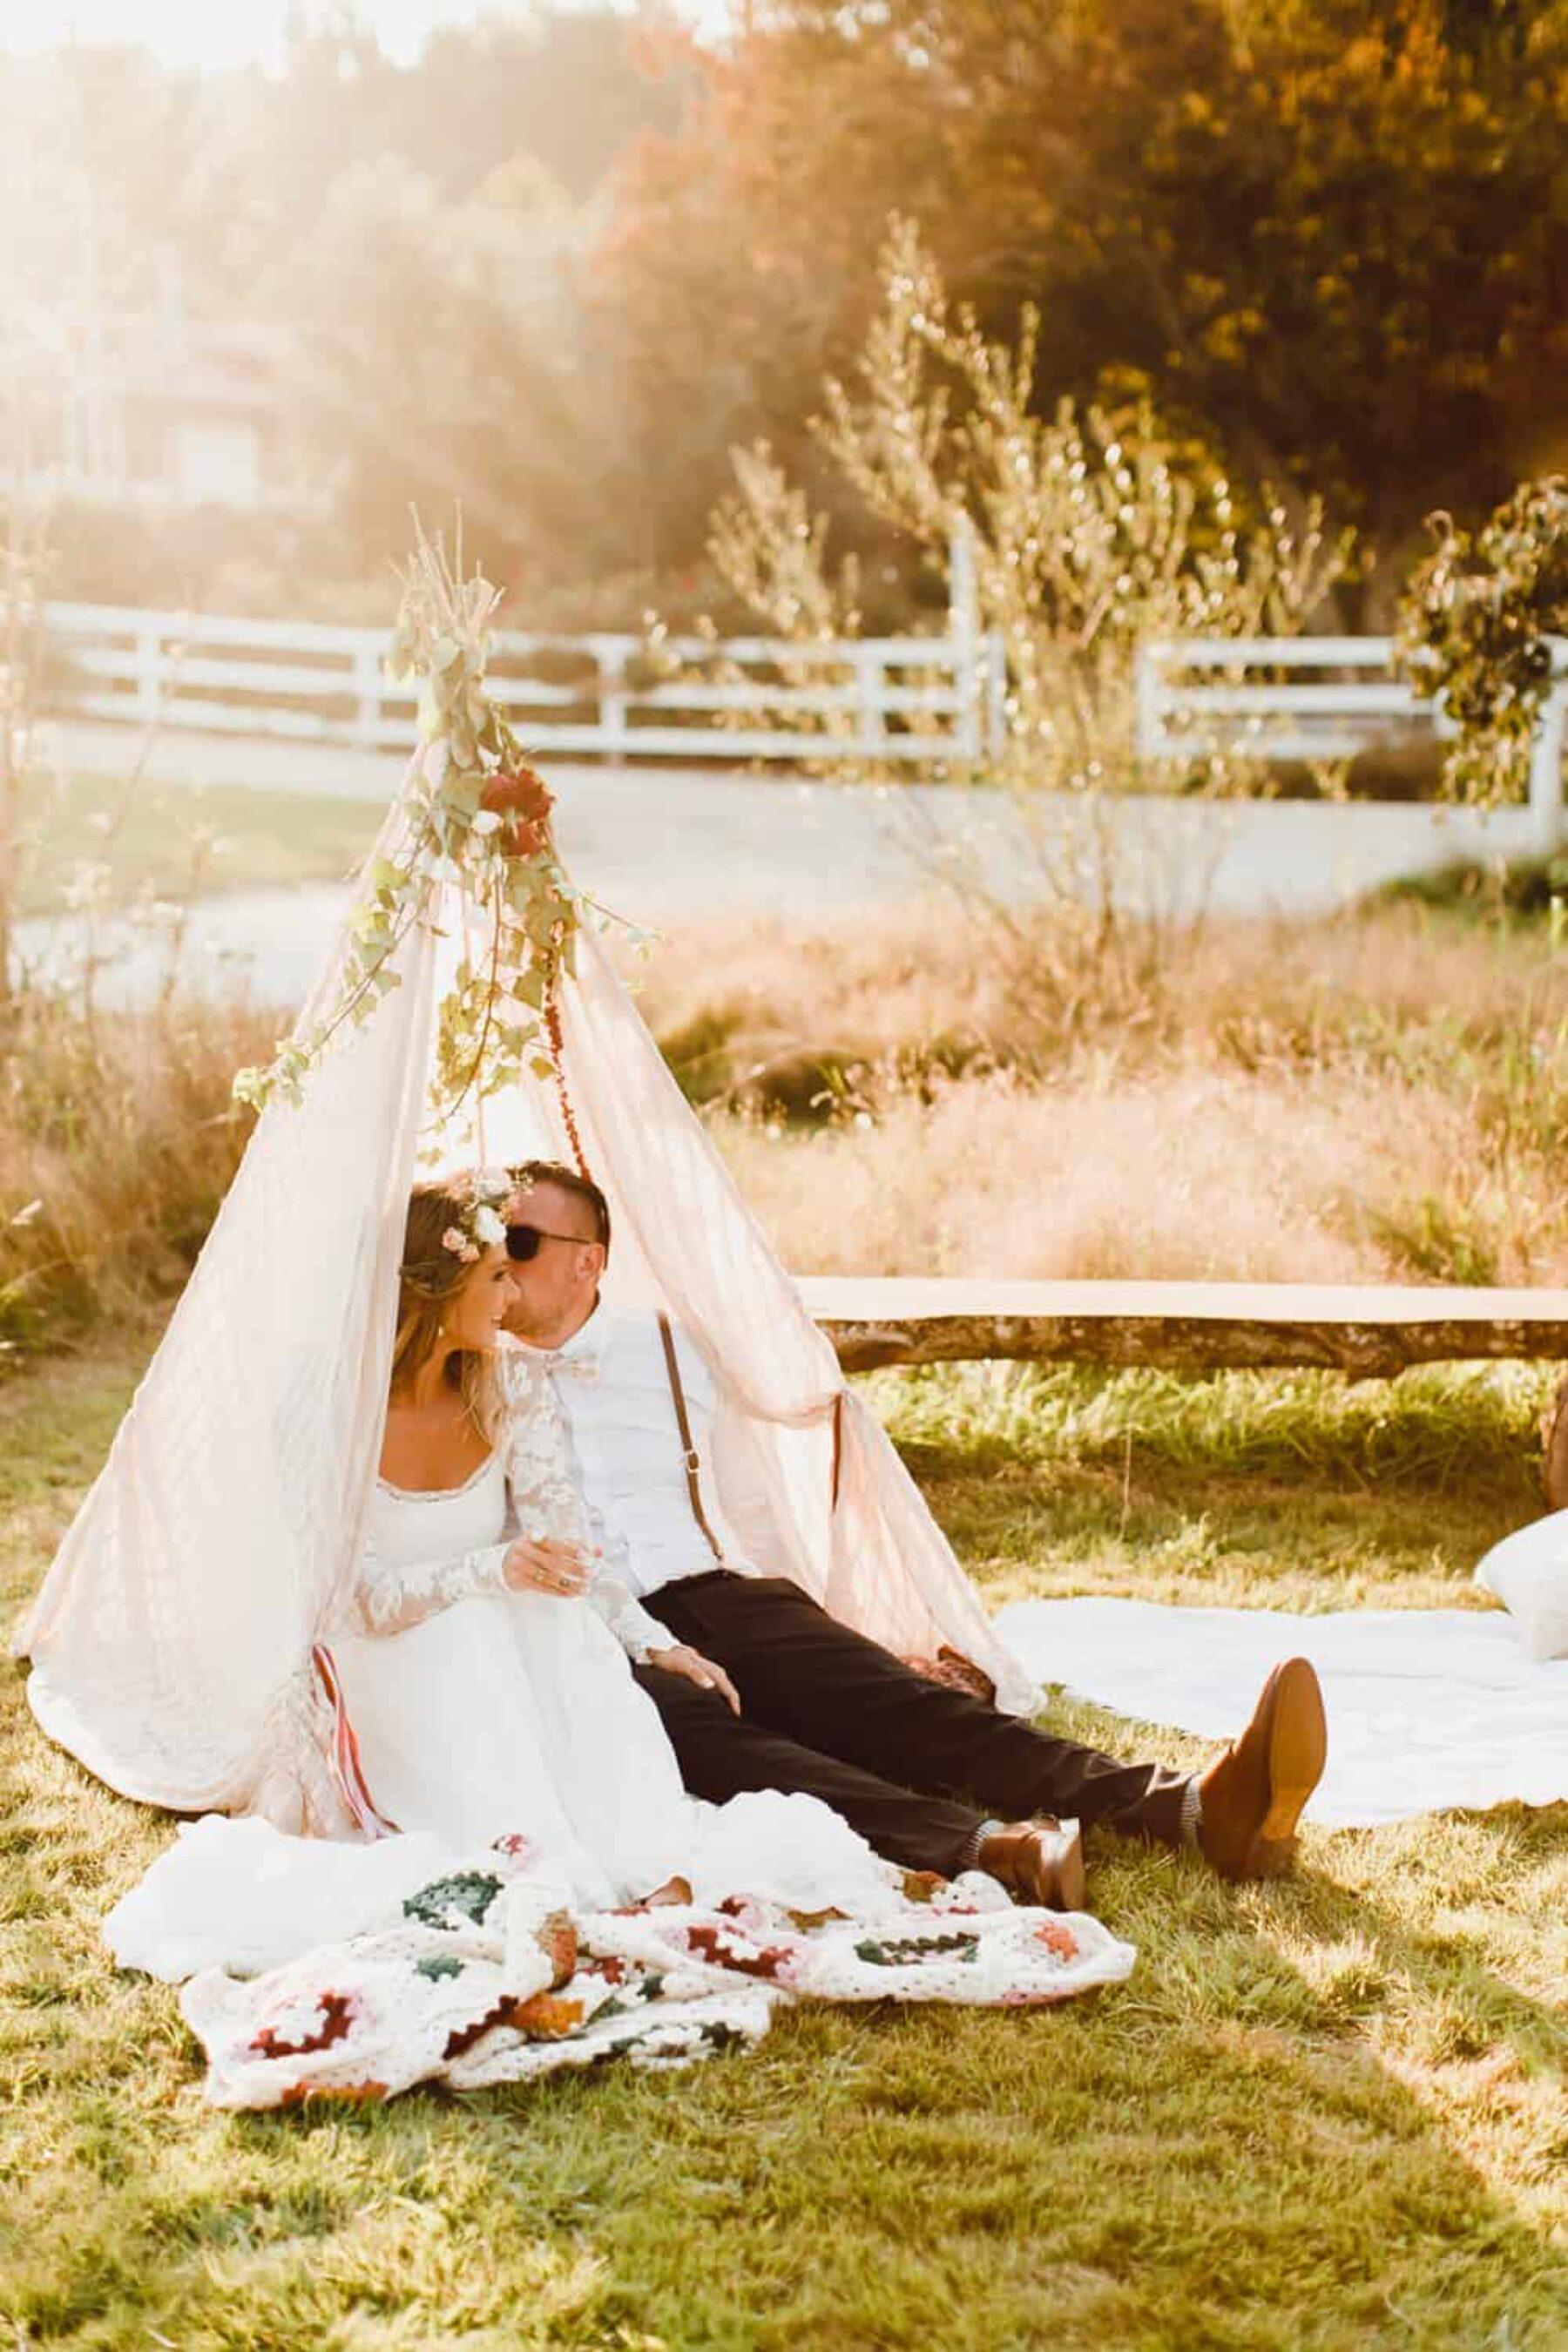 wedding tipi